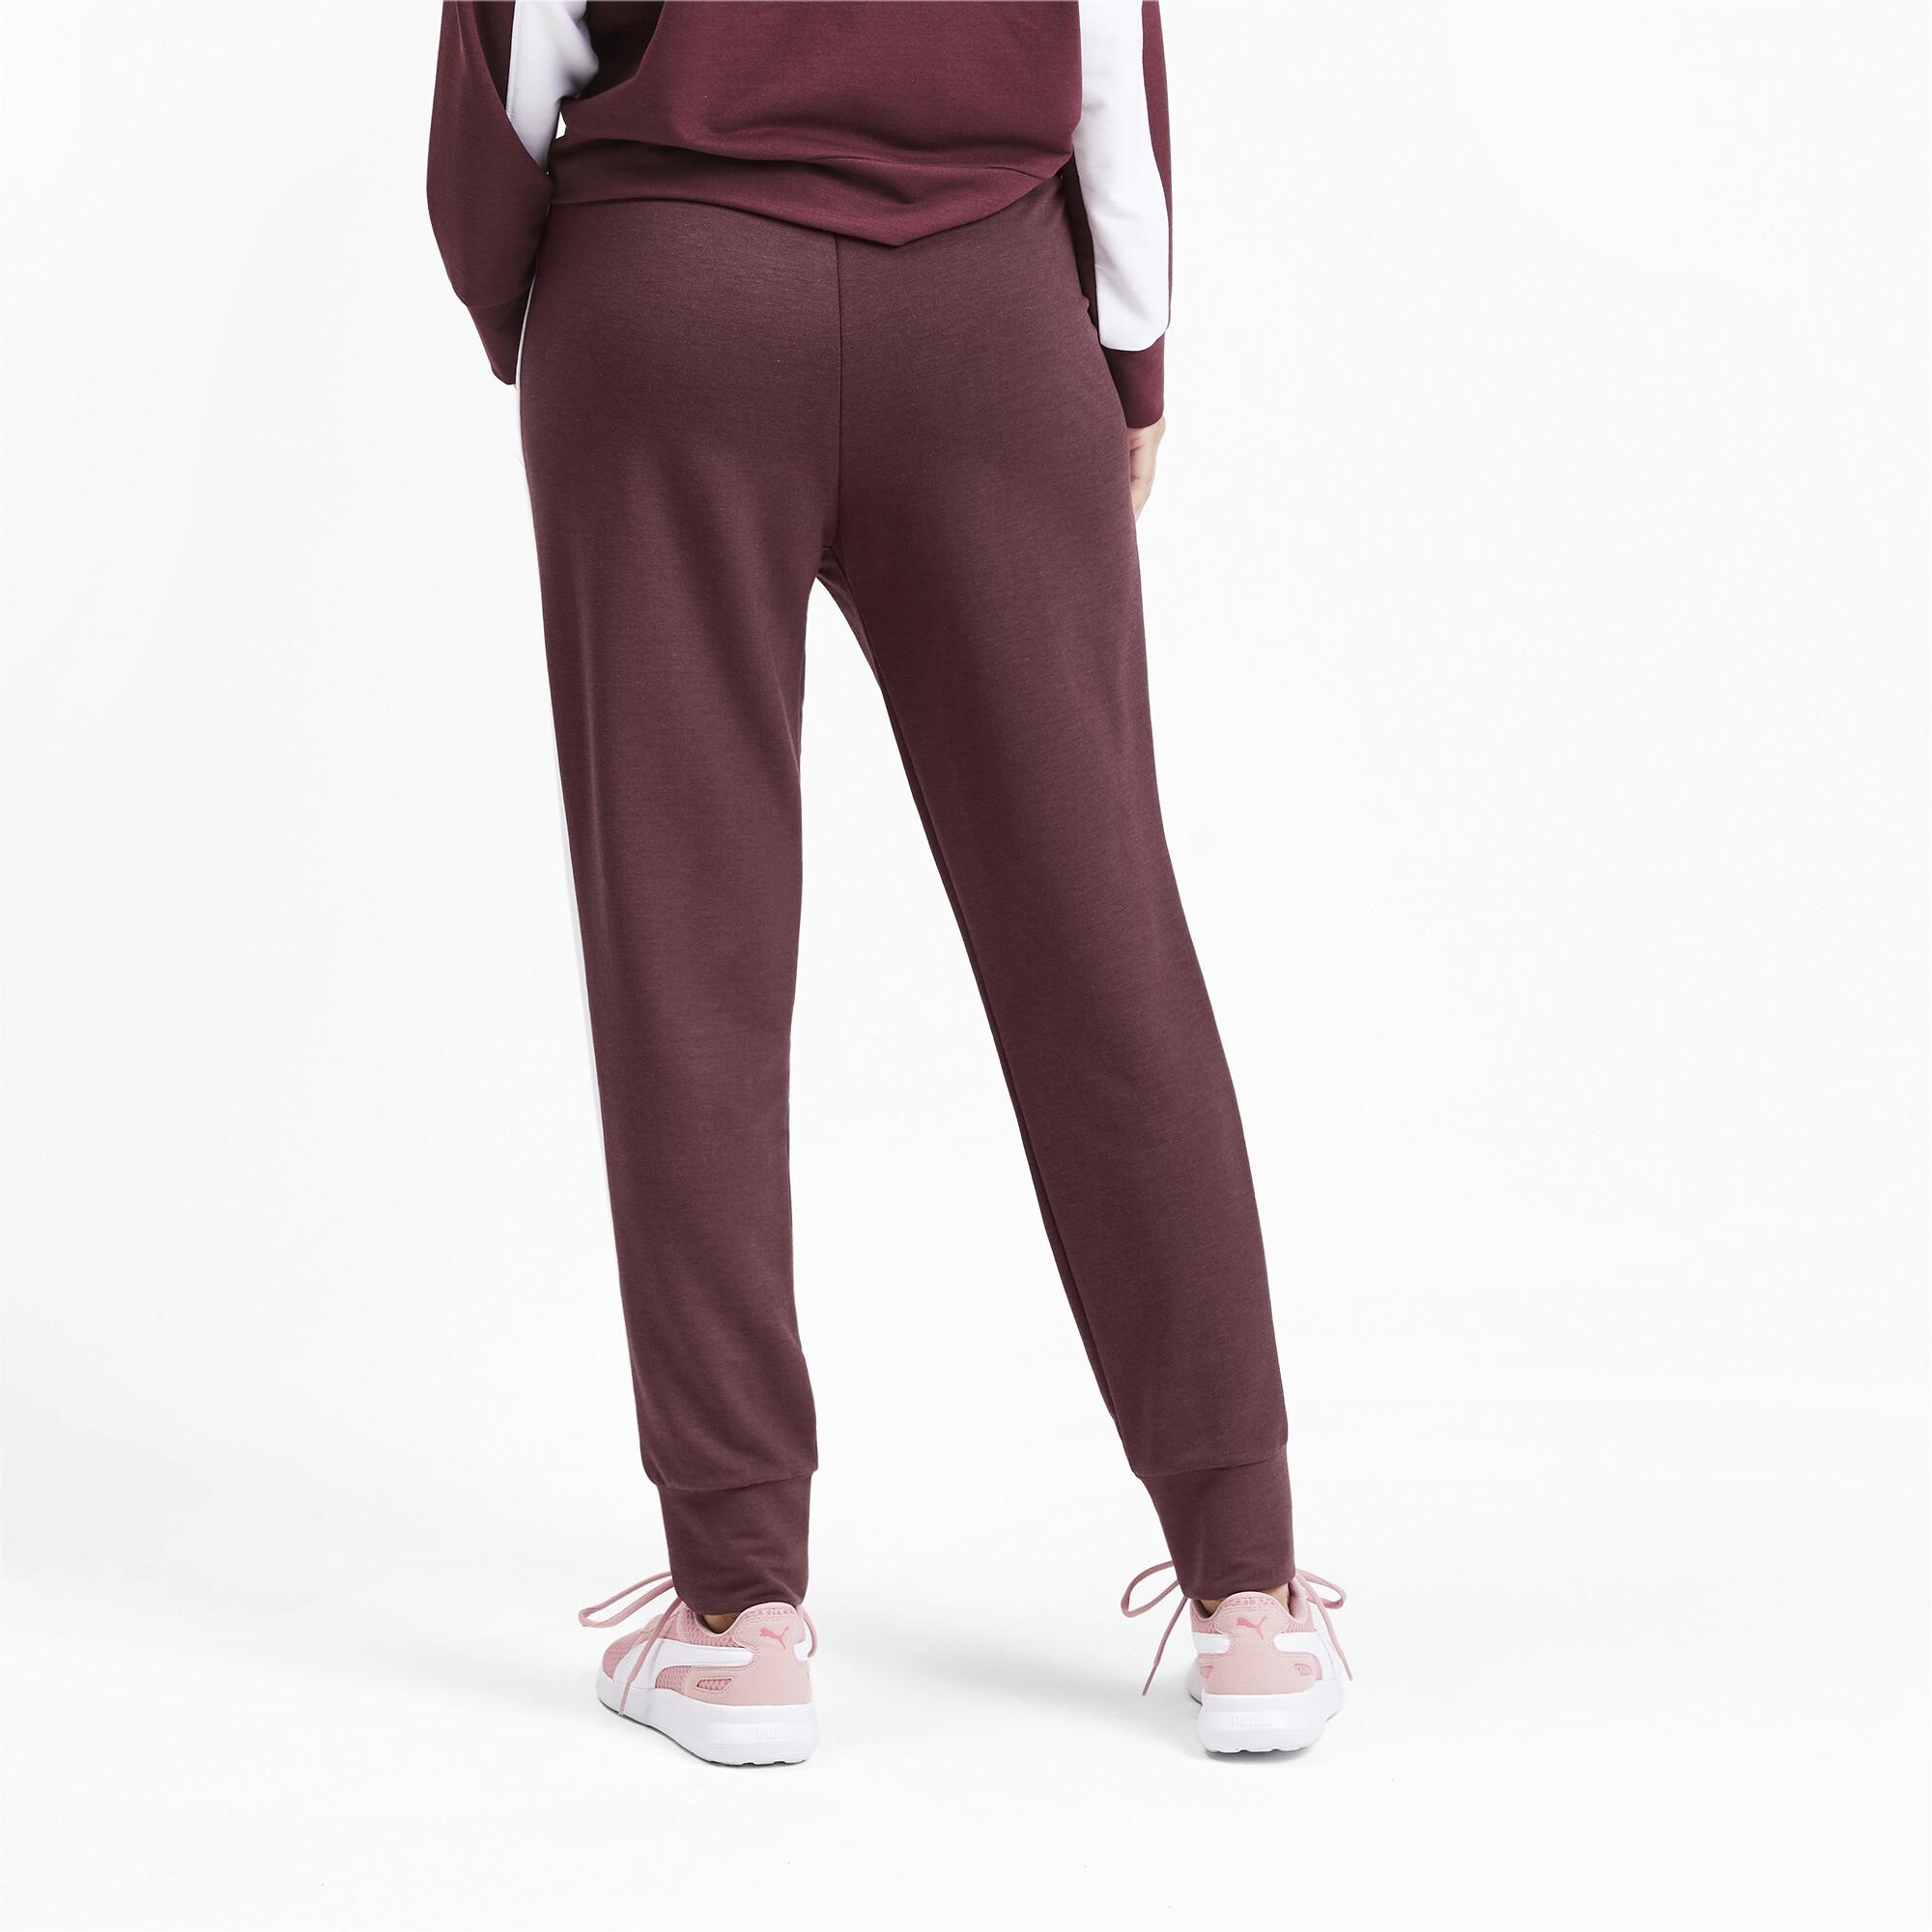 PUMA-Modern-Sports-Women-039-s-Track-Pants-Women-Knitted-Pants-Basics thumbnail 5